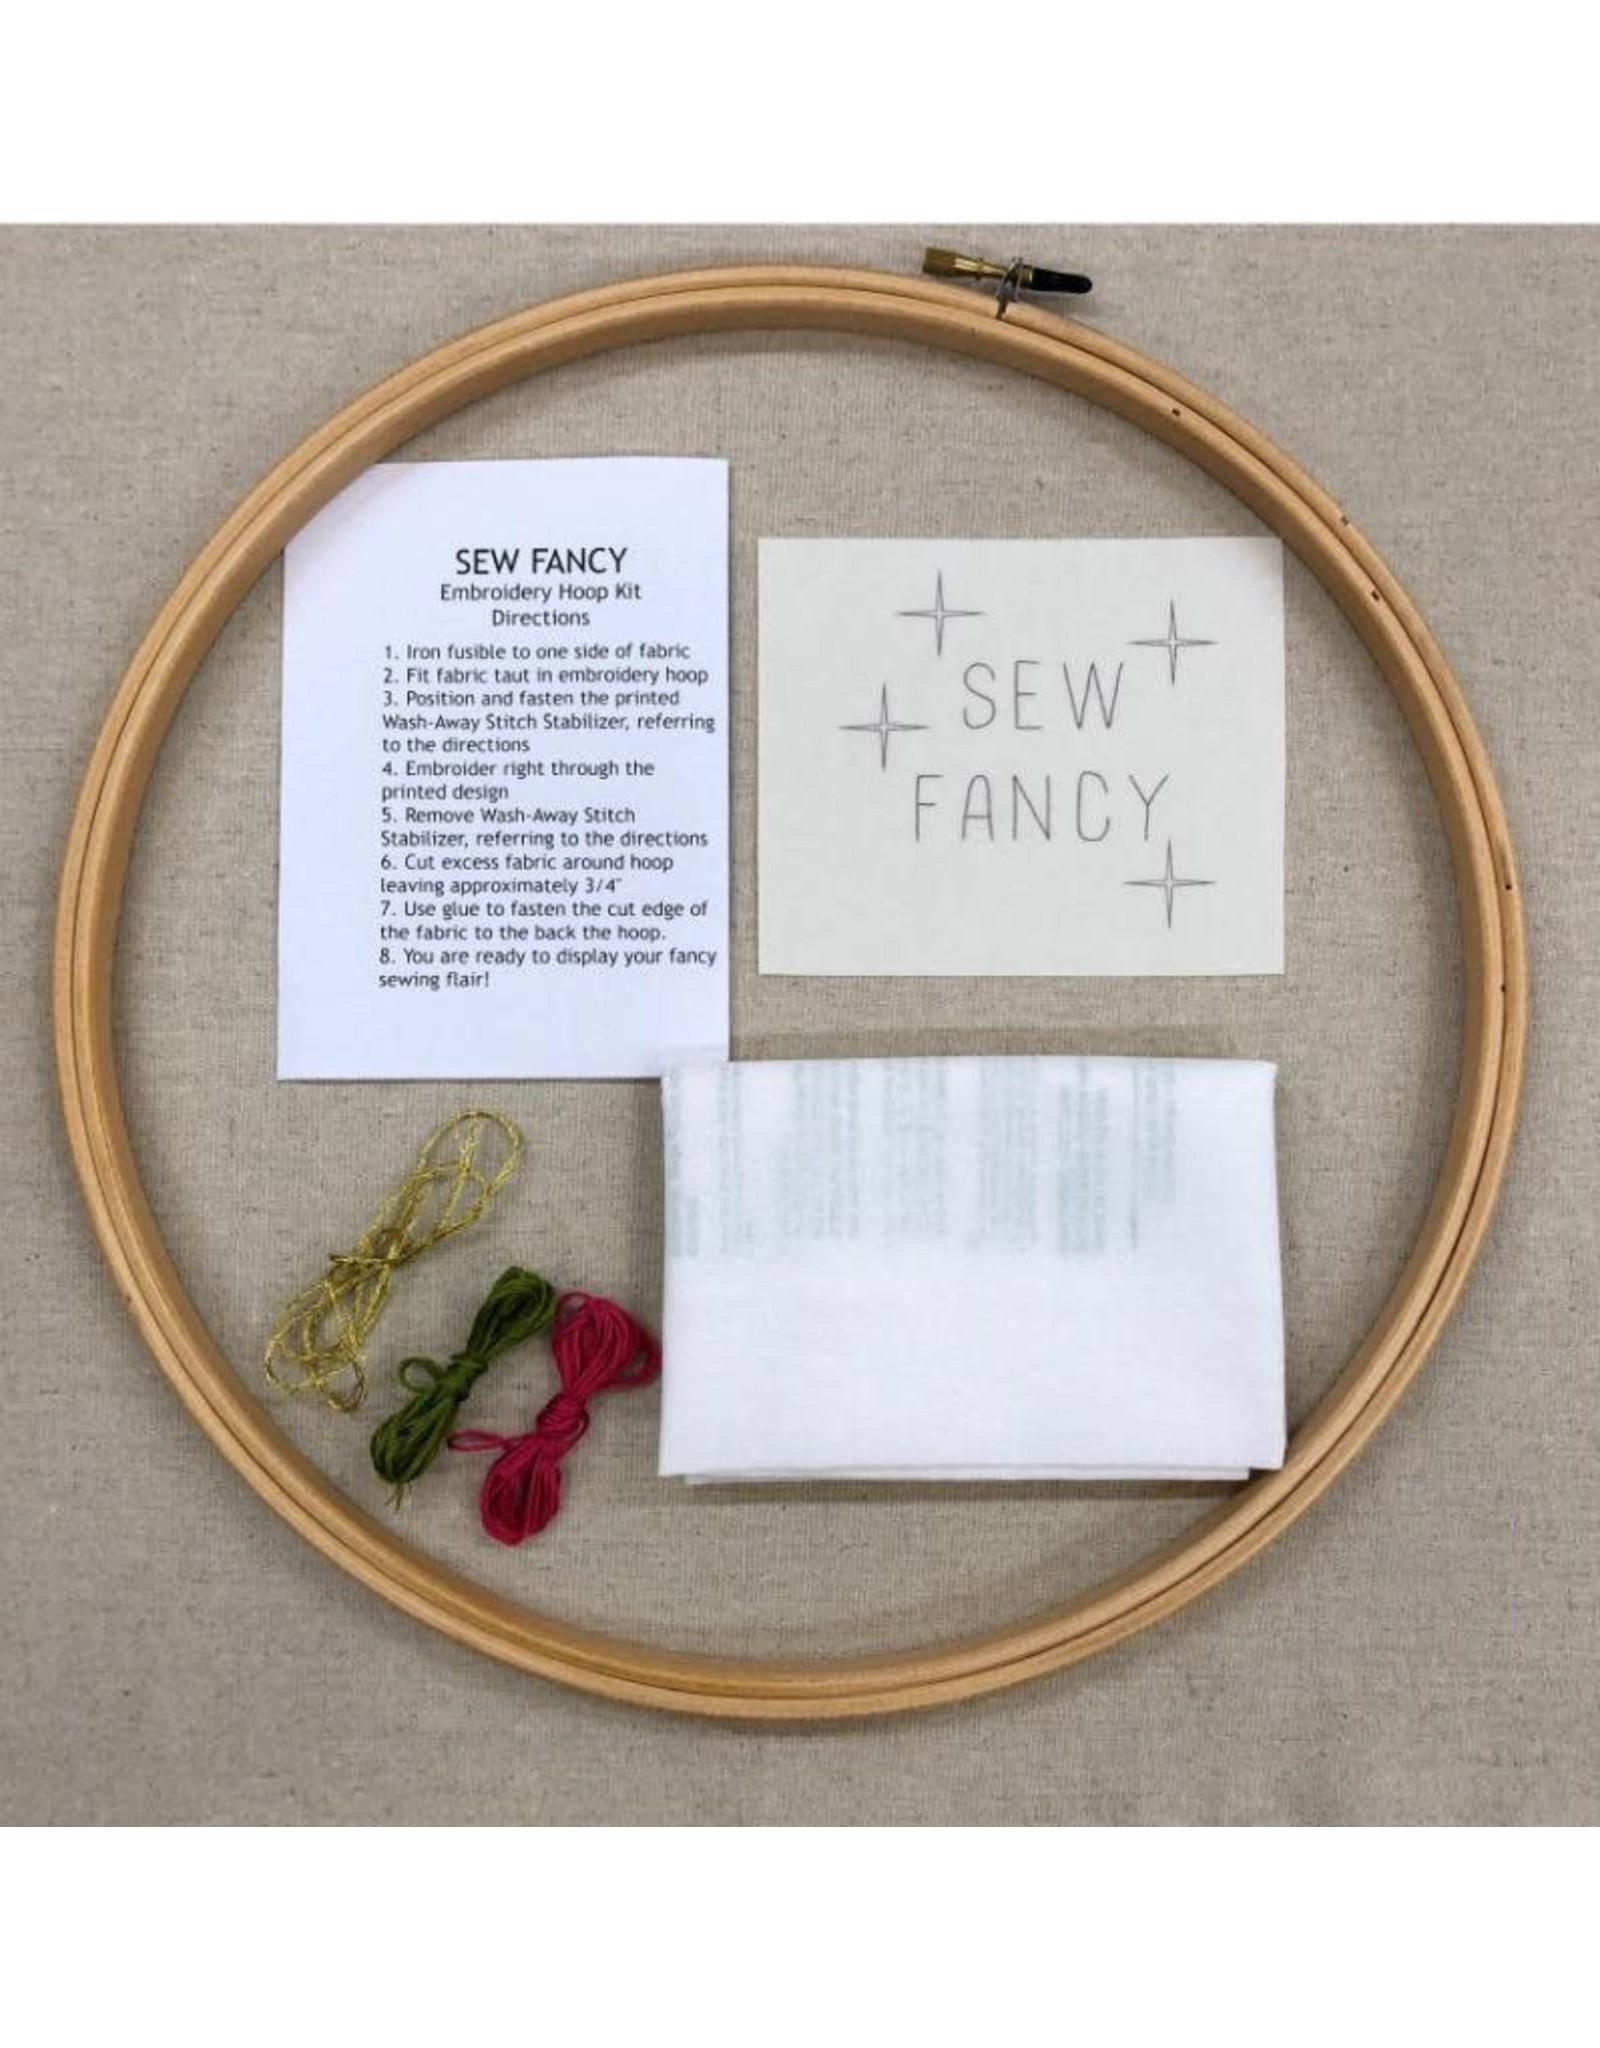 Picking Daisies SEW FANCY Embroidery Hoop Kit for Enamel Pin Display